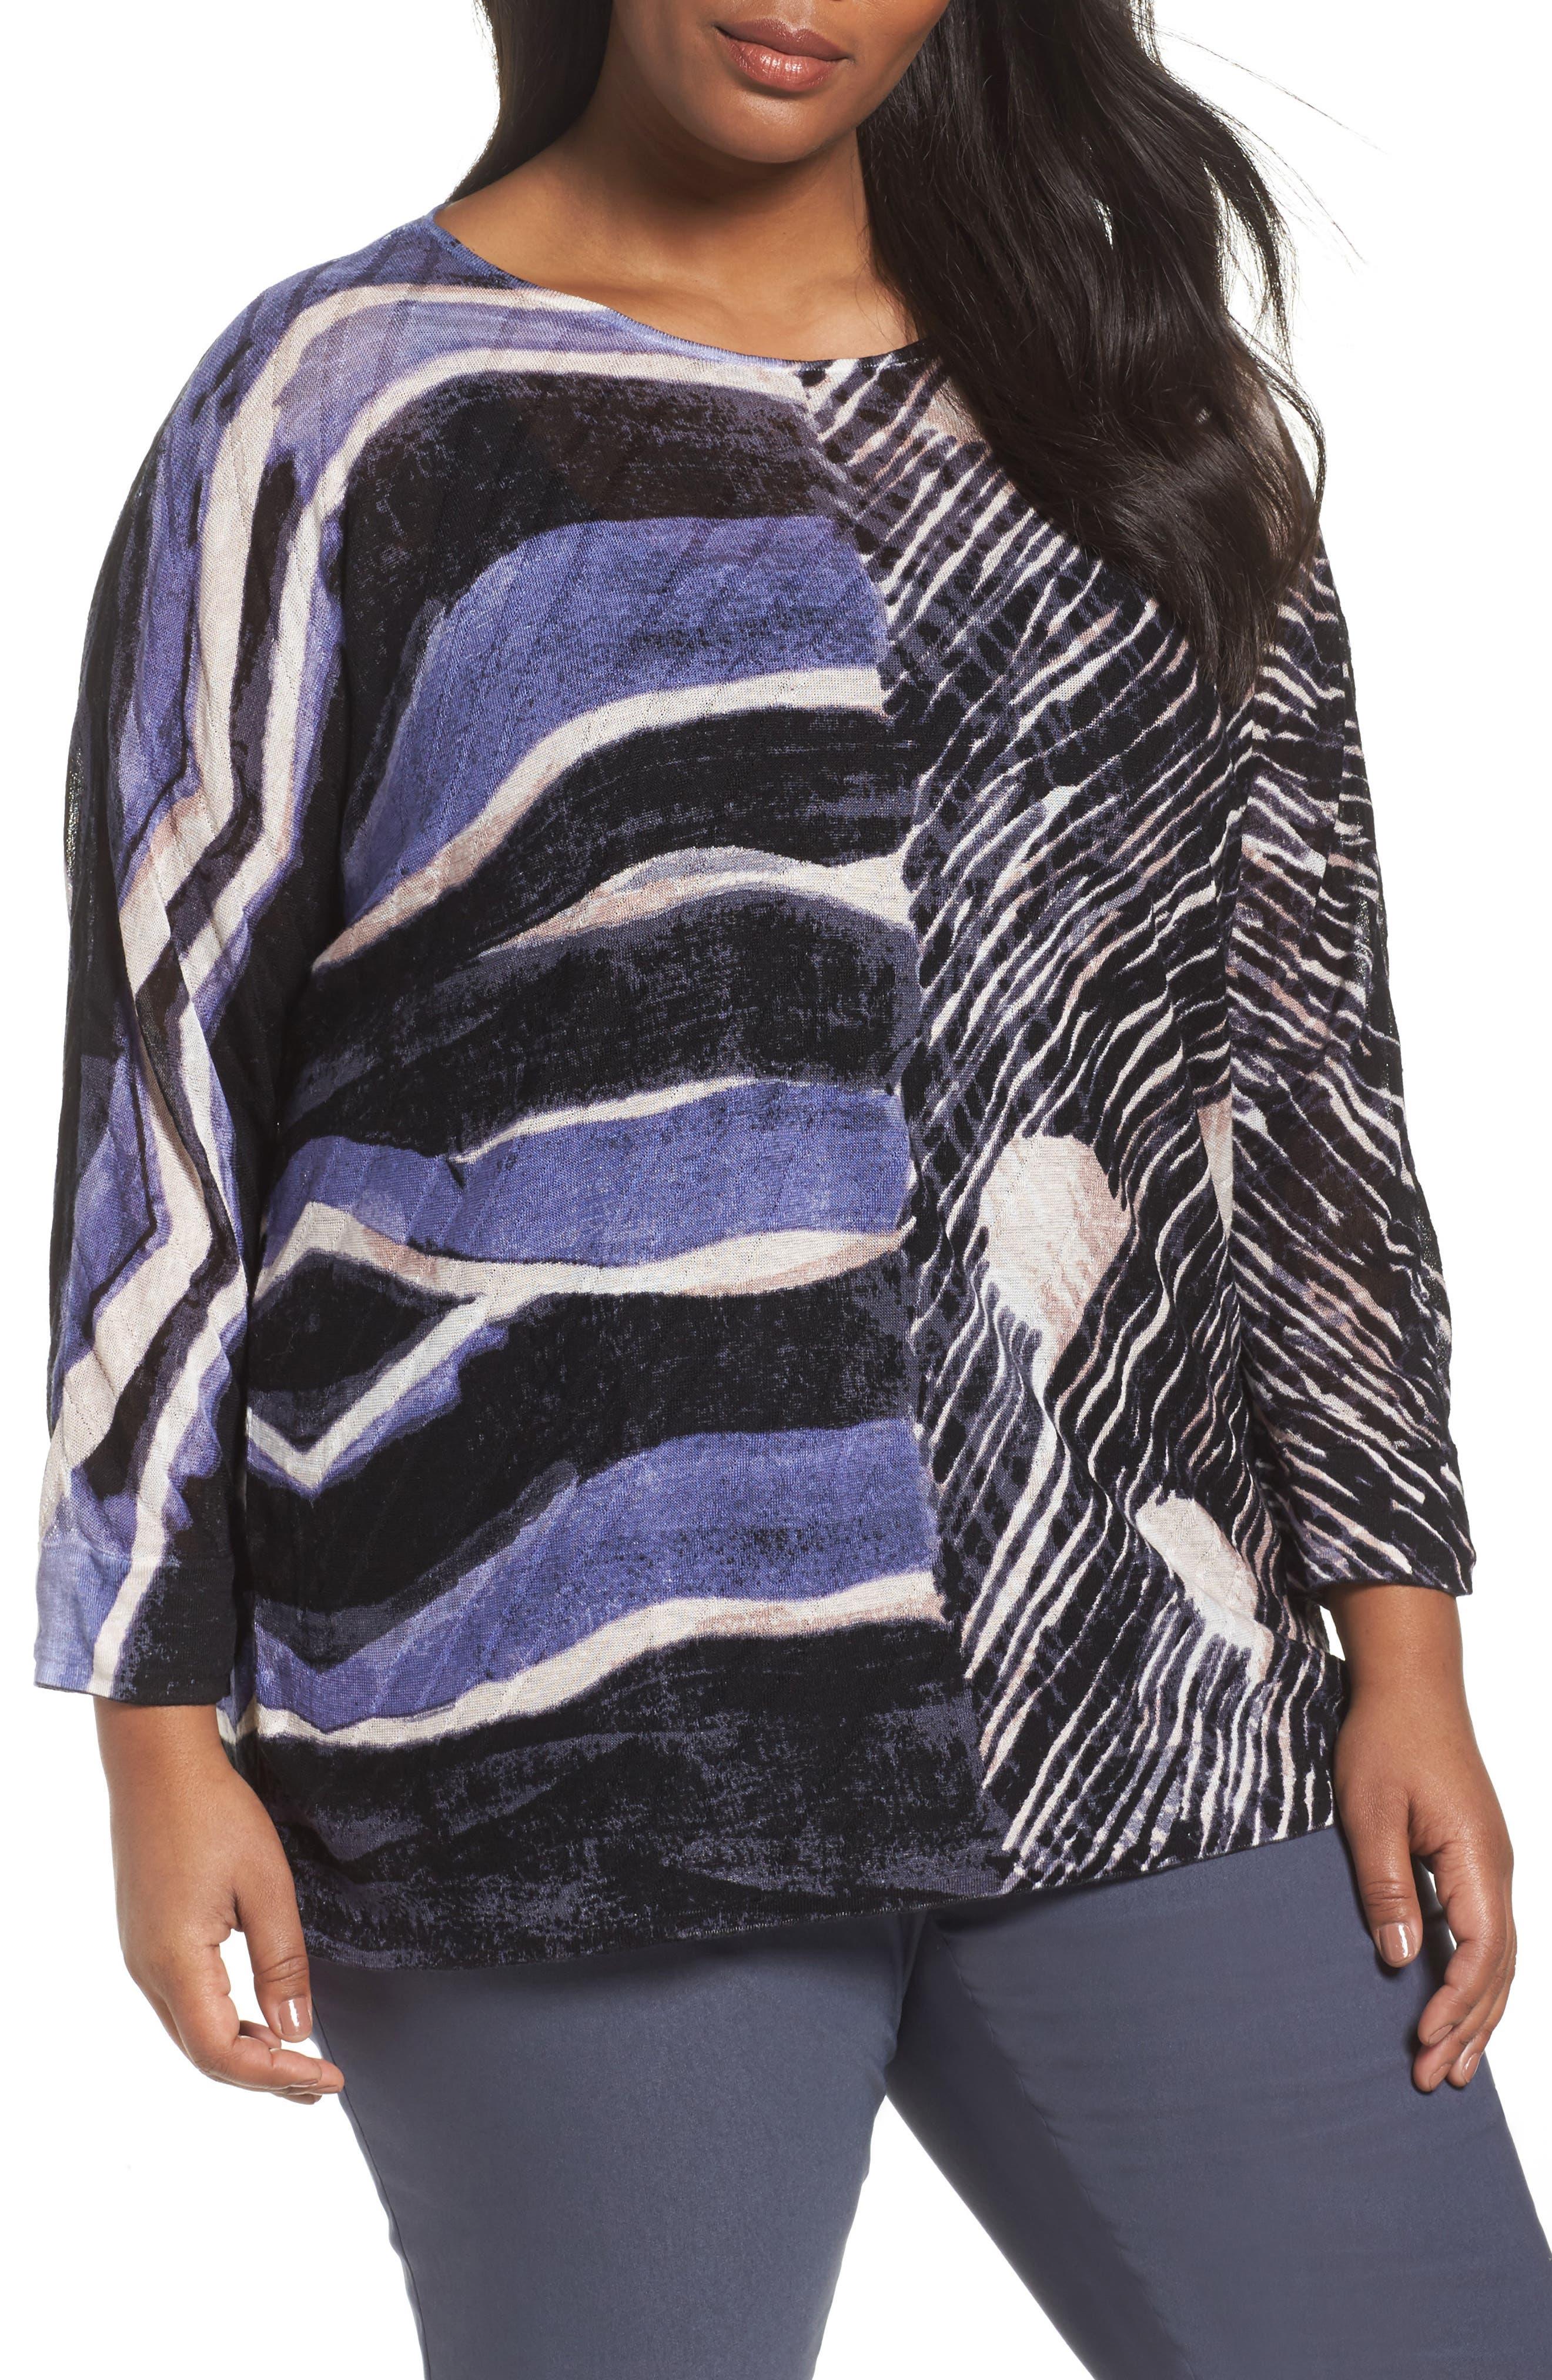 Sierra Sweater,                         Main,                         color, BLUE MULTI